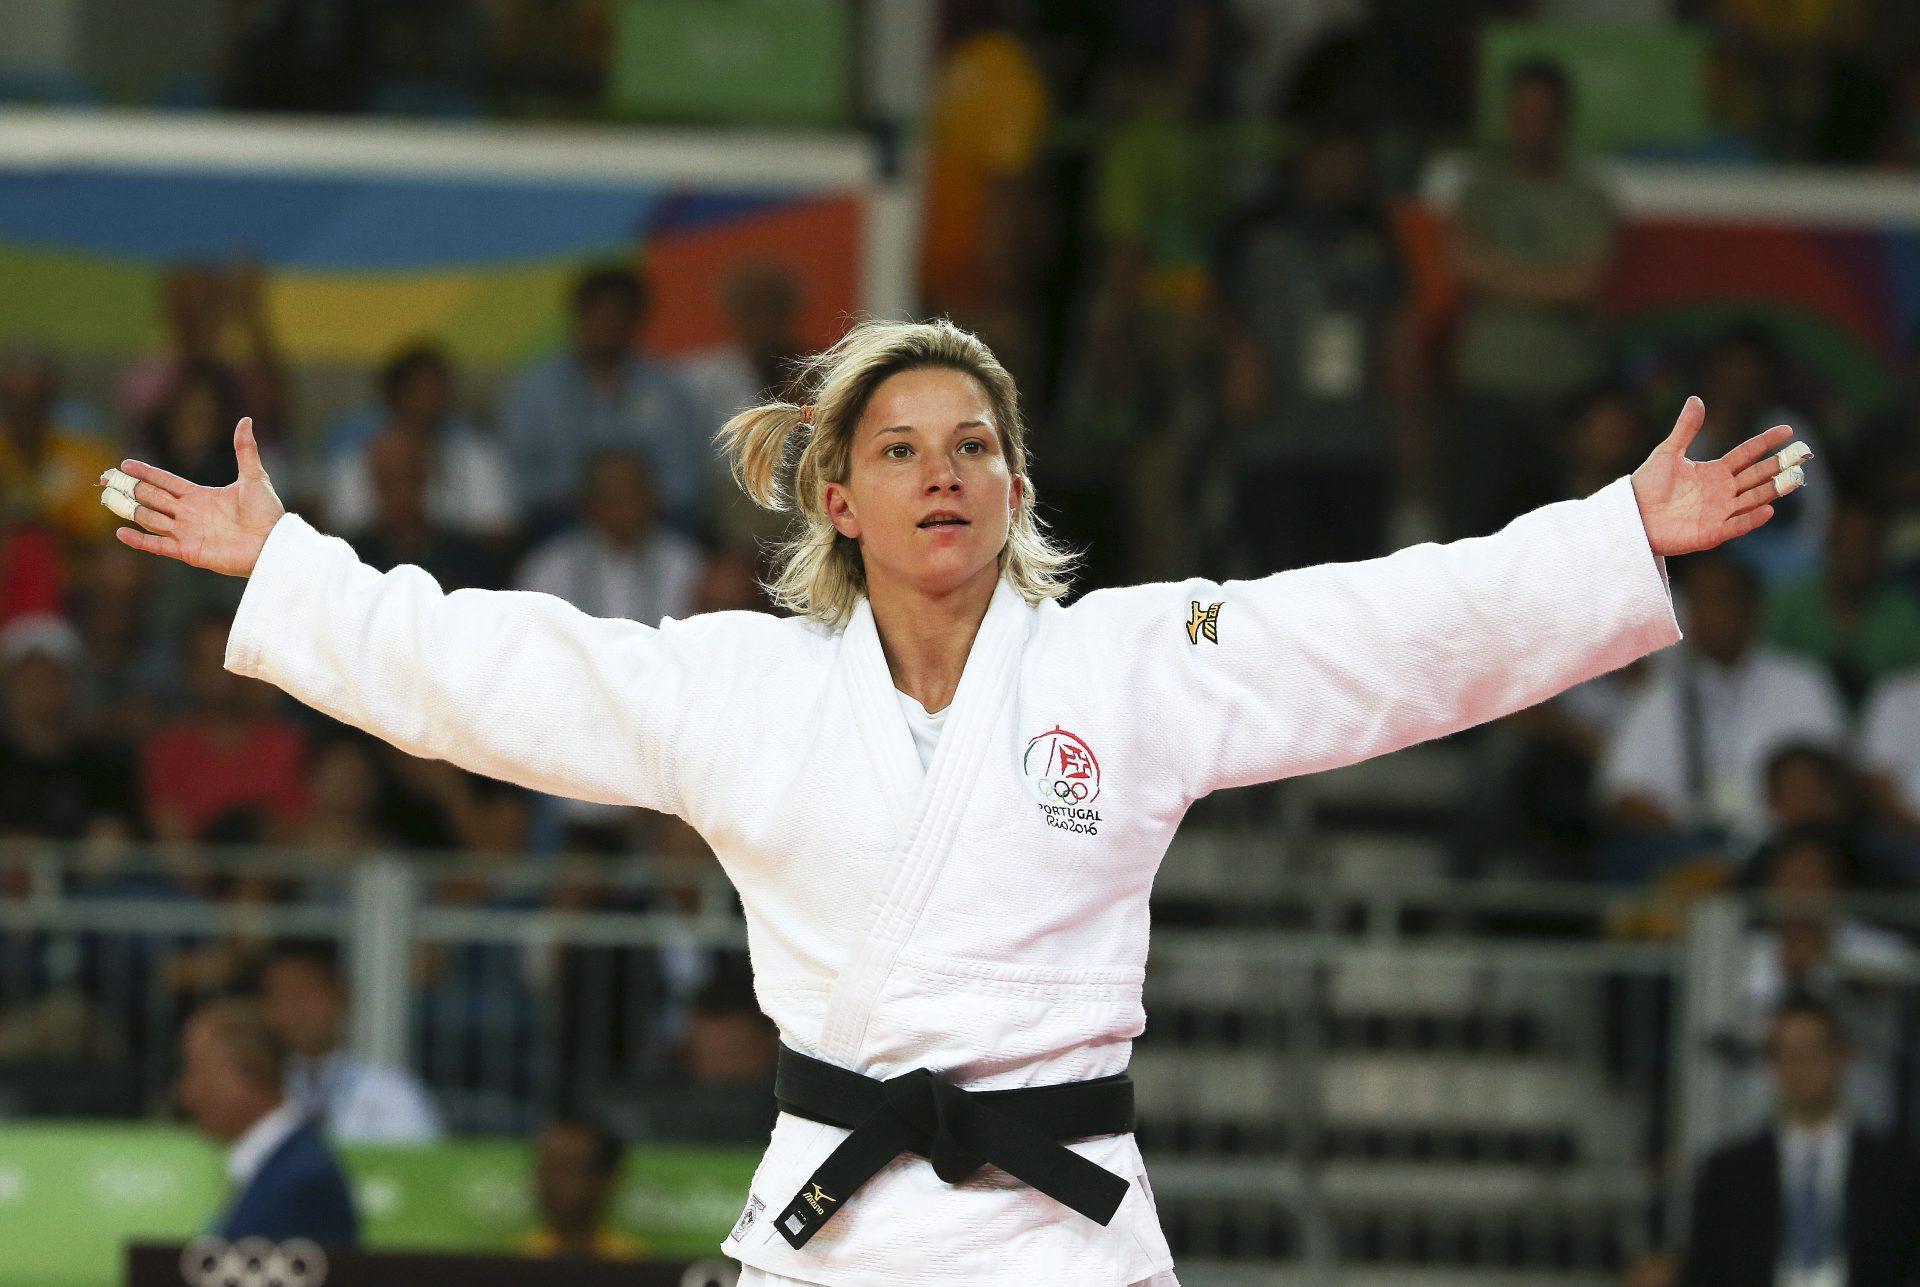 O grande dia olímpico de Telma Monteiro